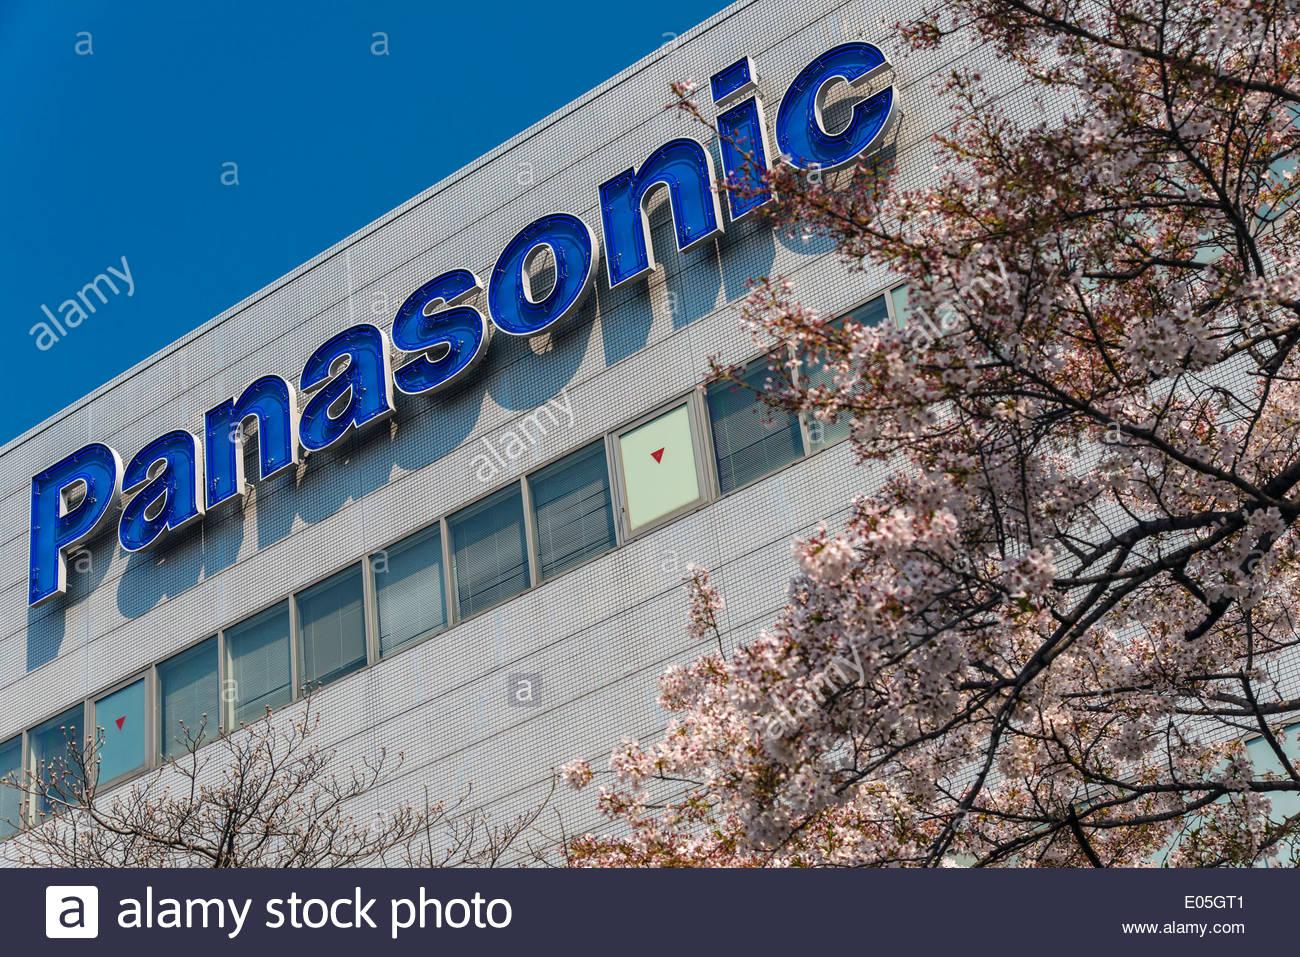 Panasonic corporation building with blooming cherry tree in springtime, Kyoto, Japan - Stock Image